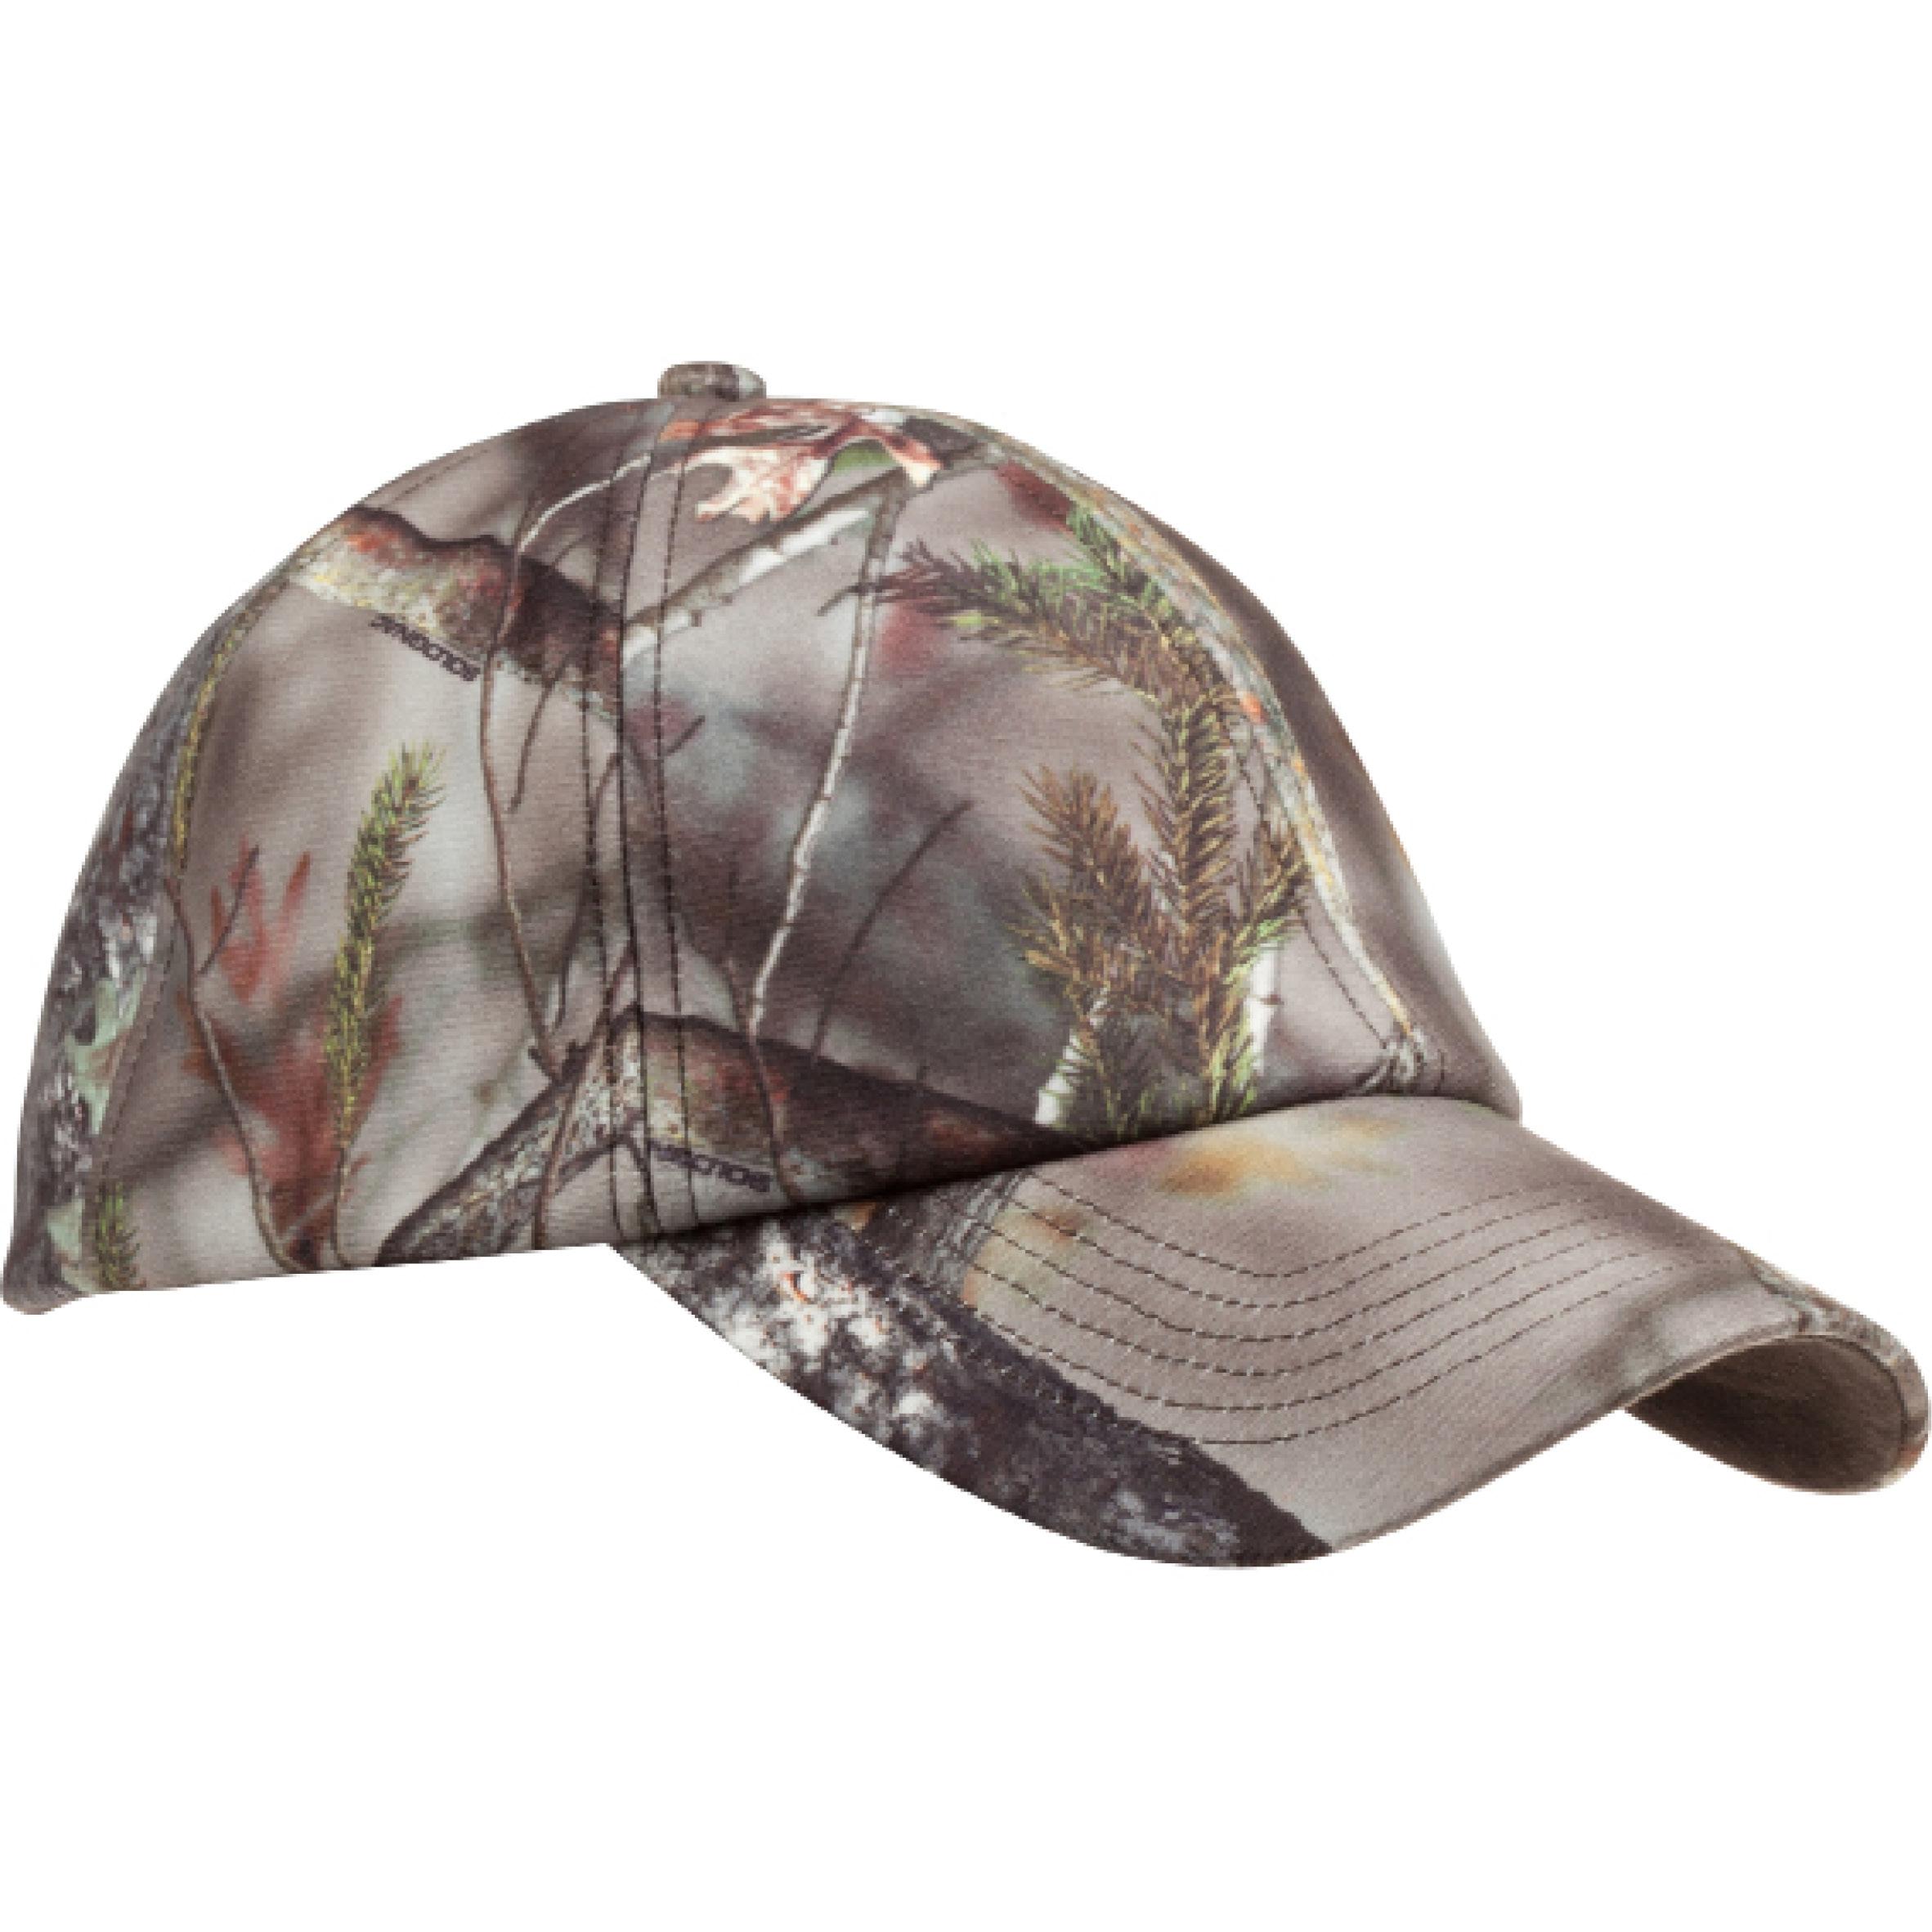 Actikam Warm Hunting Cap - Camouflage